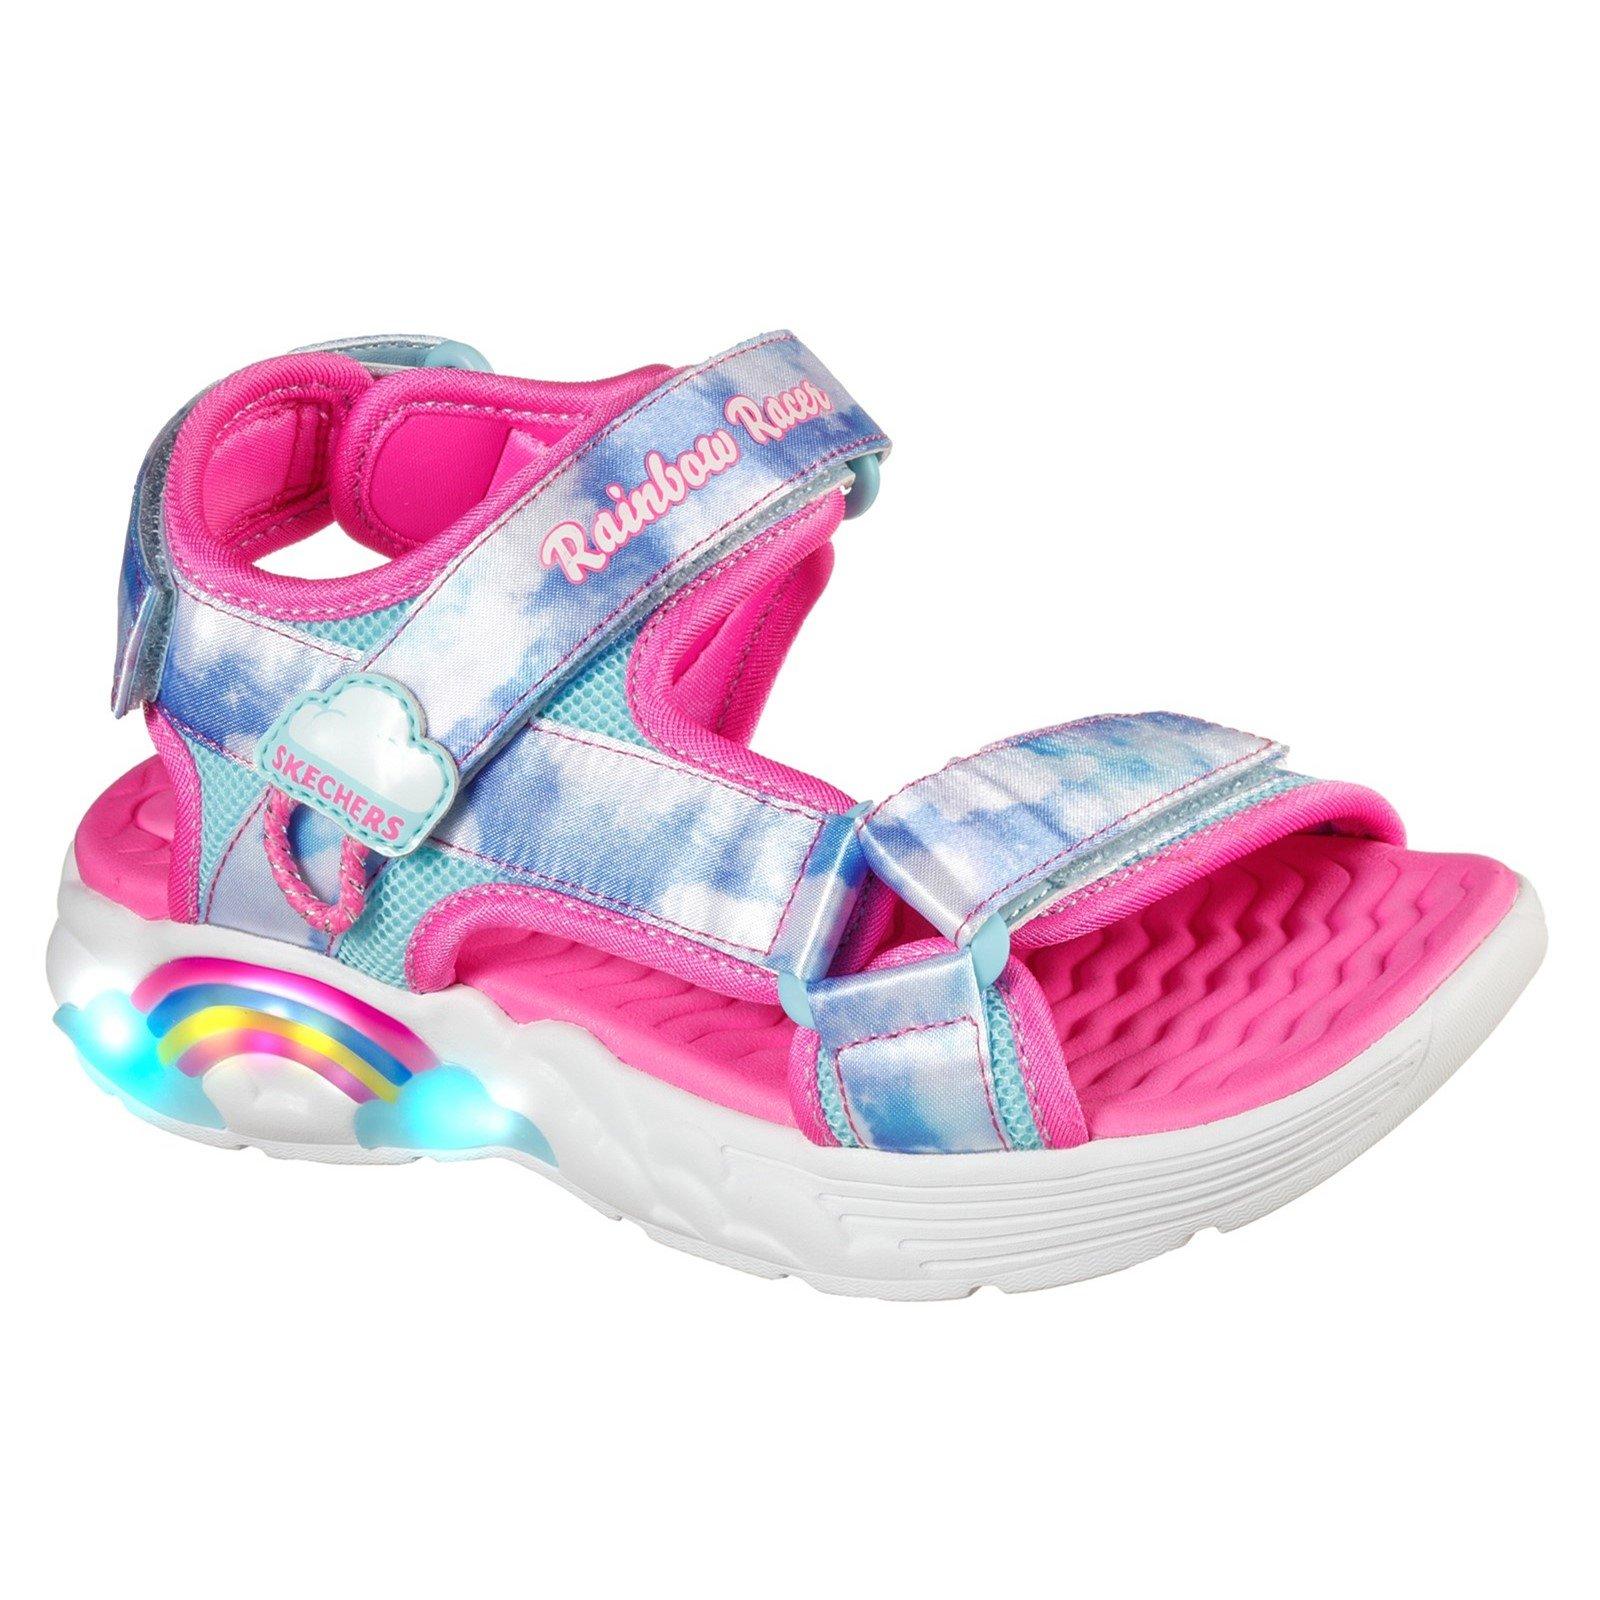 Skechers Unisex Rainbow Racer Summer Sky Beach Sandals Multicolor 32096 - Pink/Blue Textile 12